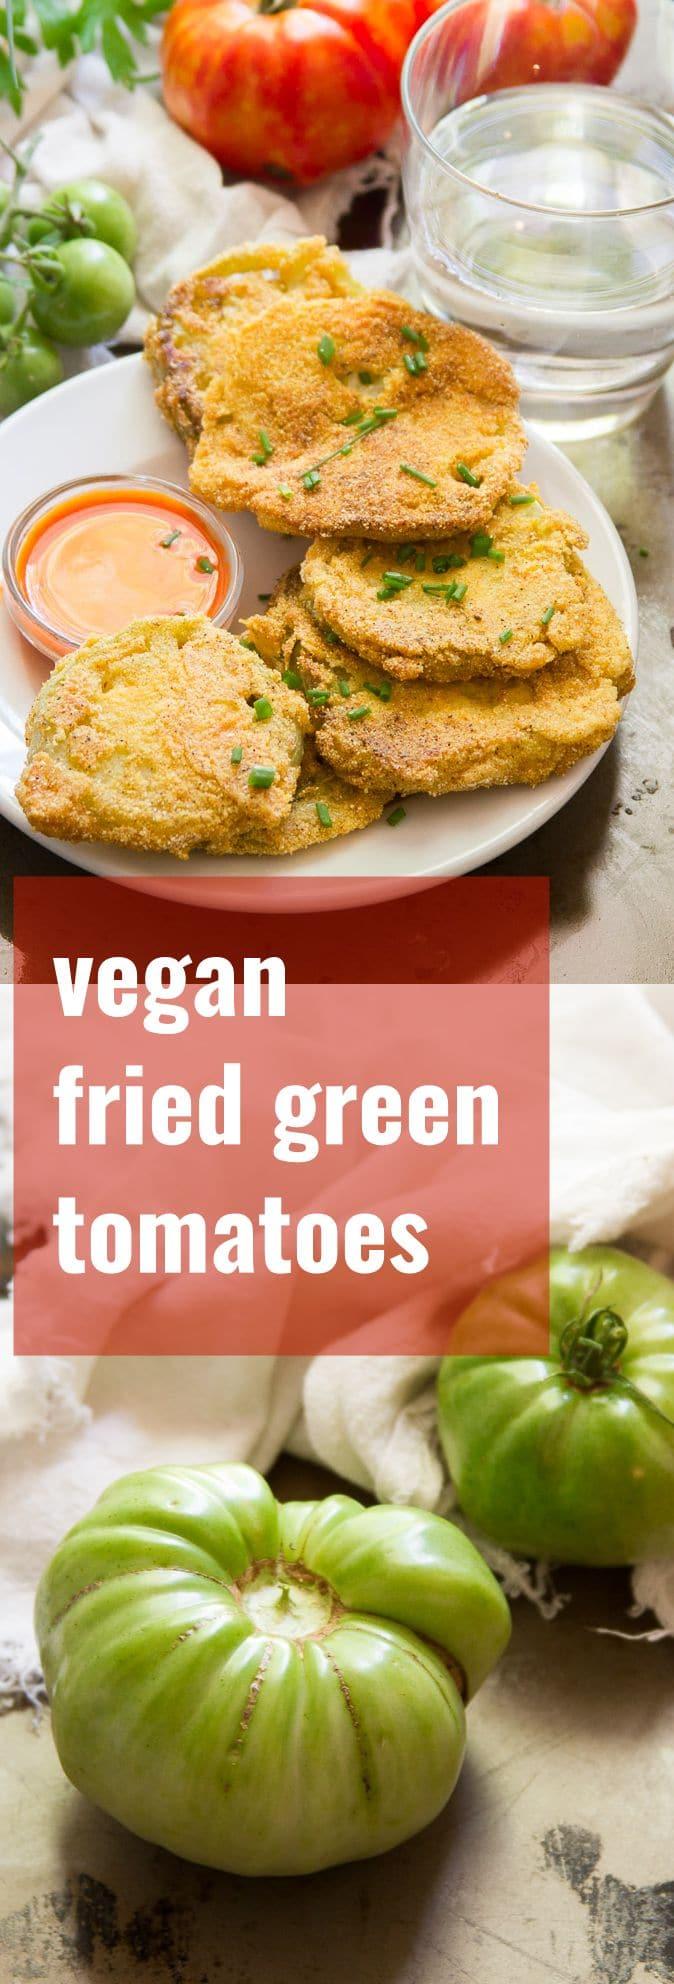 Vegan Fried Green Tomatoes